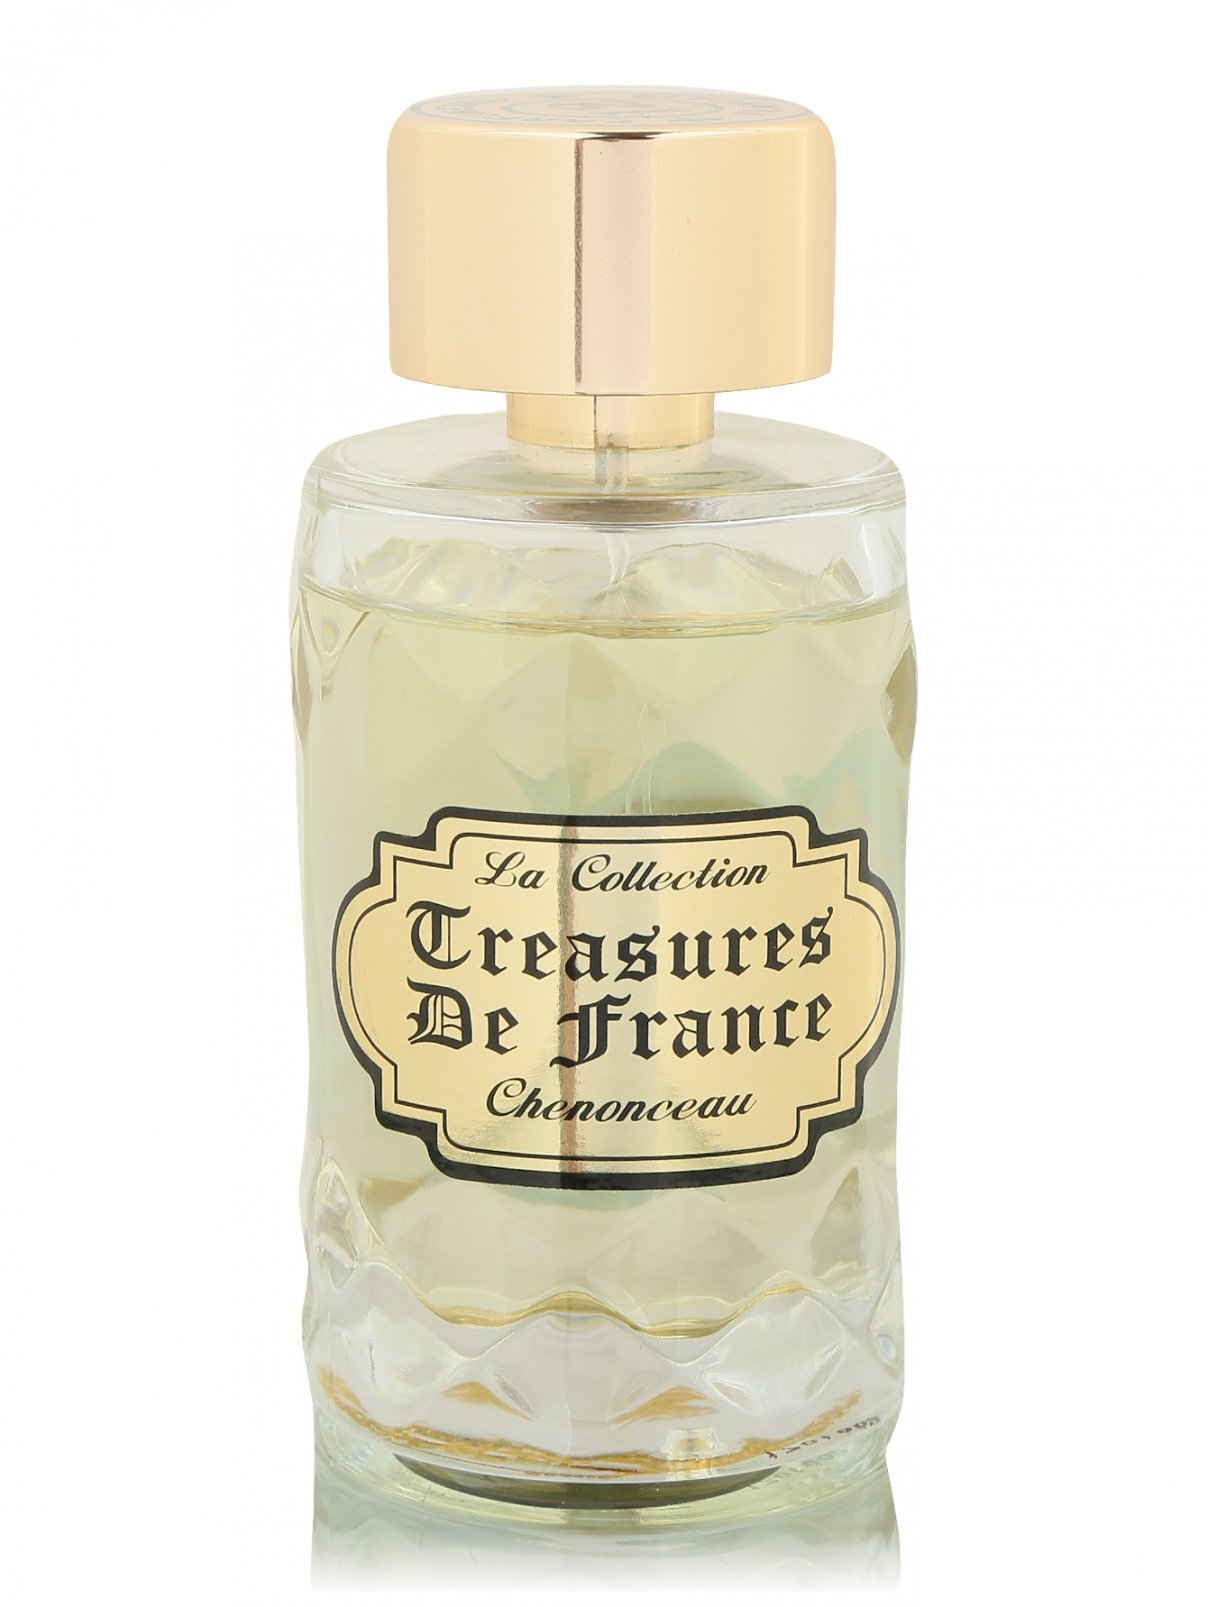 Парфюмерная вода 100 мл CHENONCEAU Treasures De France 12 Parfumeurs Francais  –  Общий вид